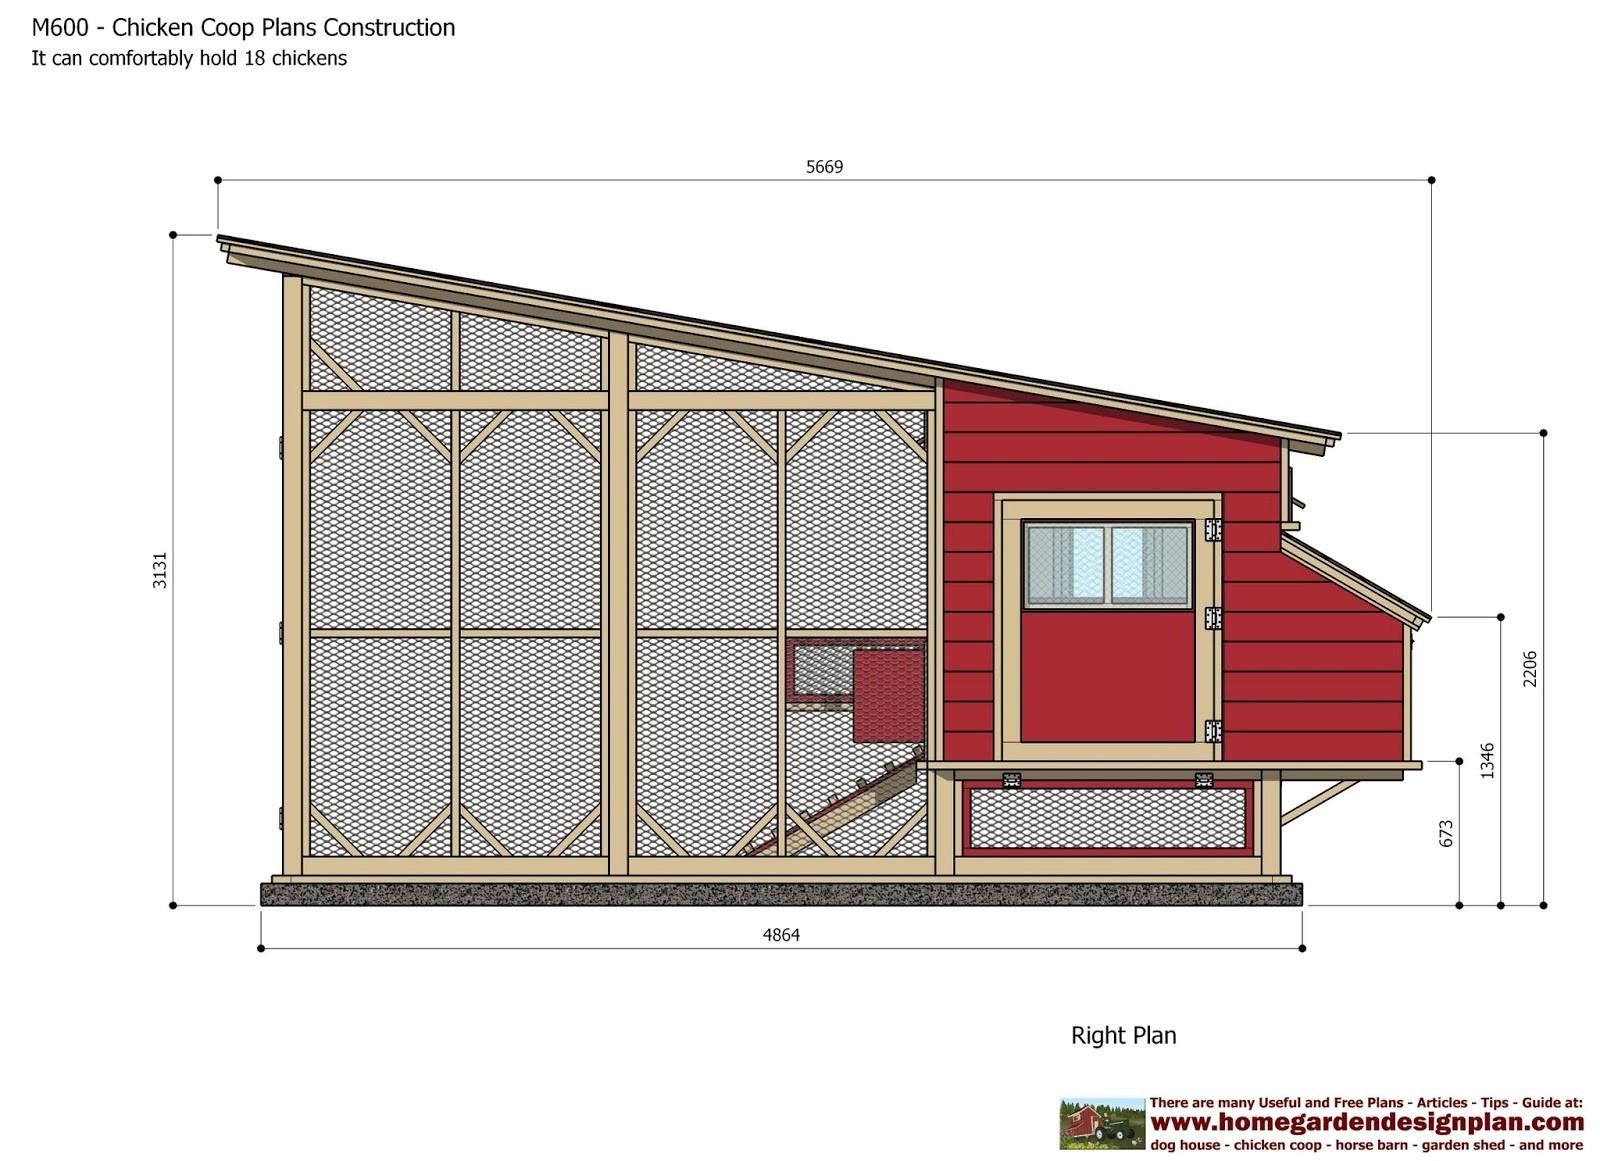 m600 chicken coop plans construction